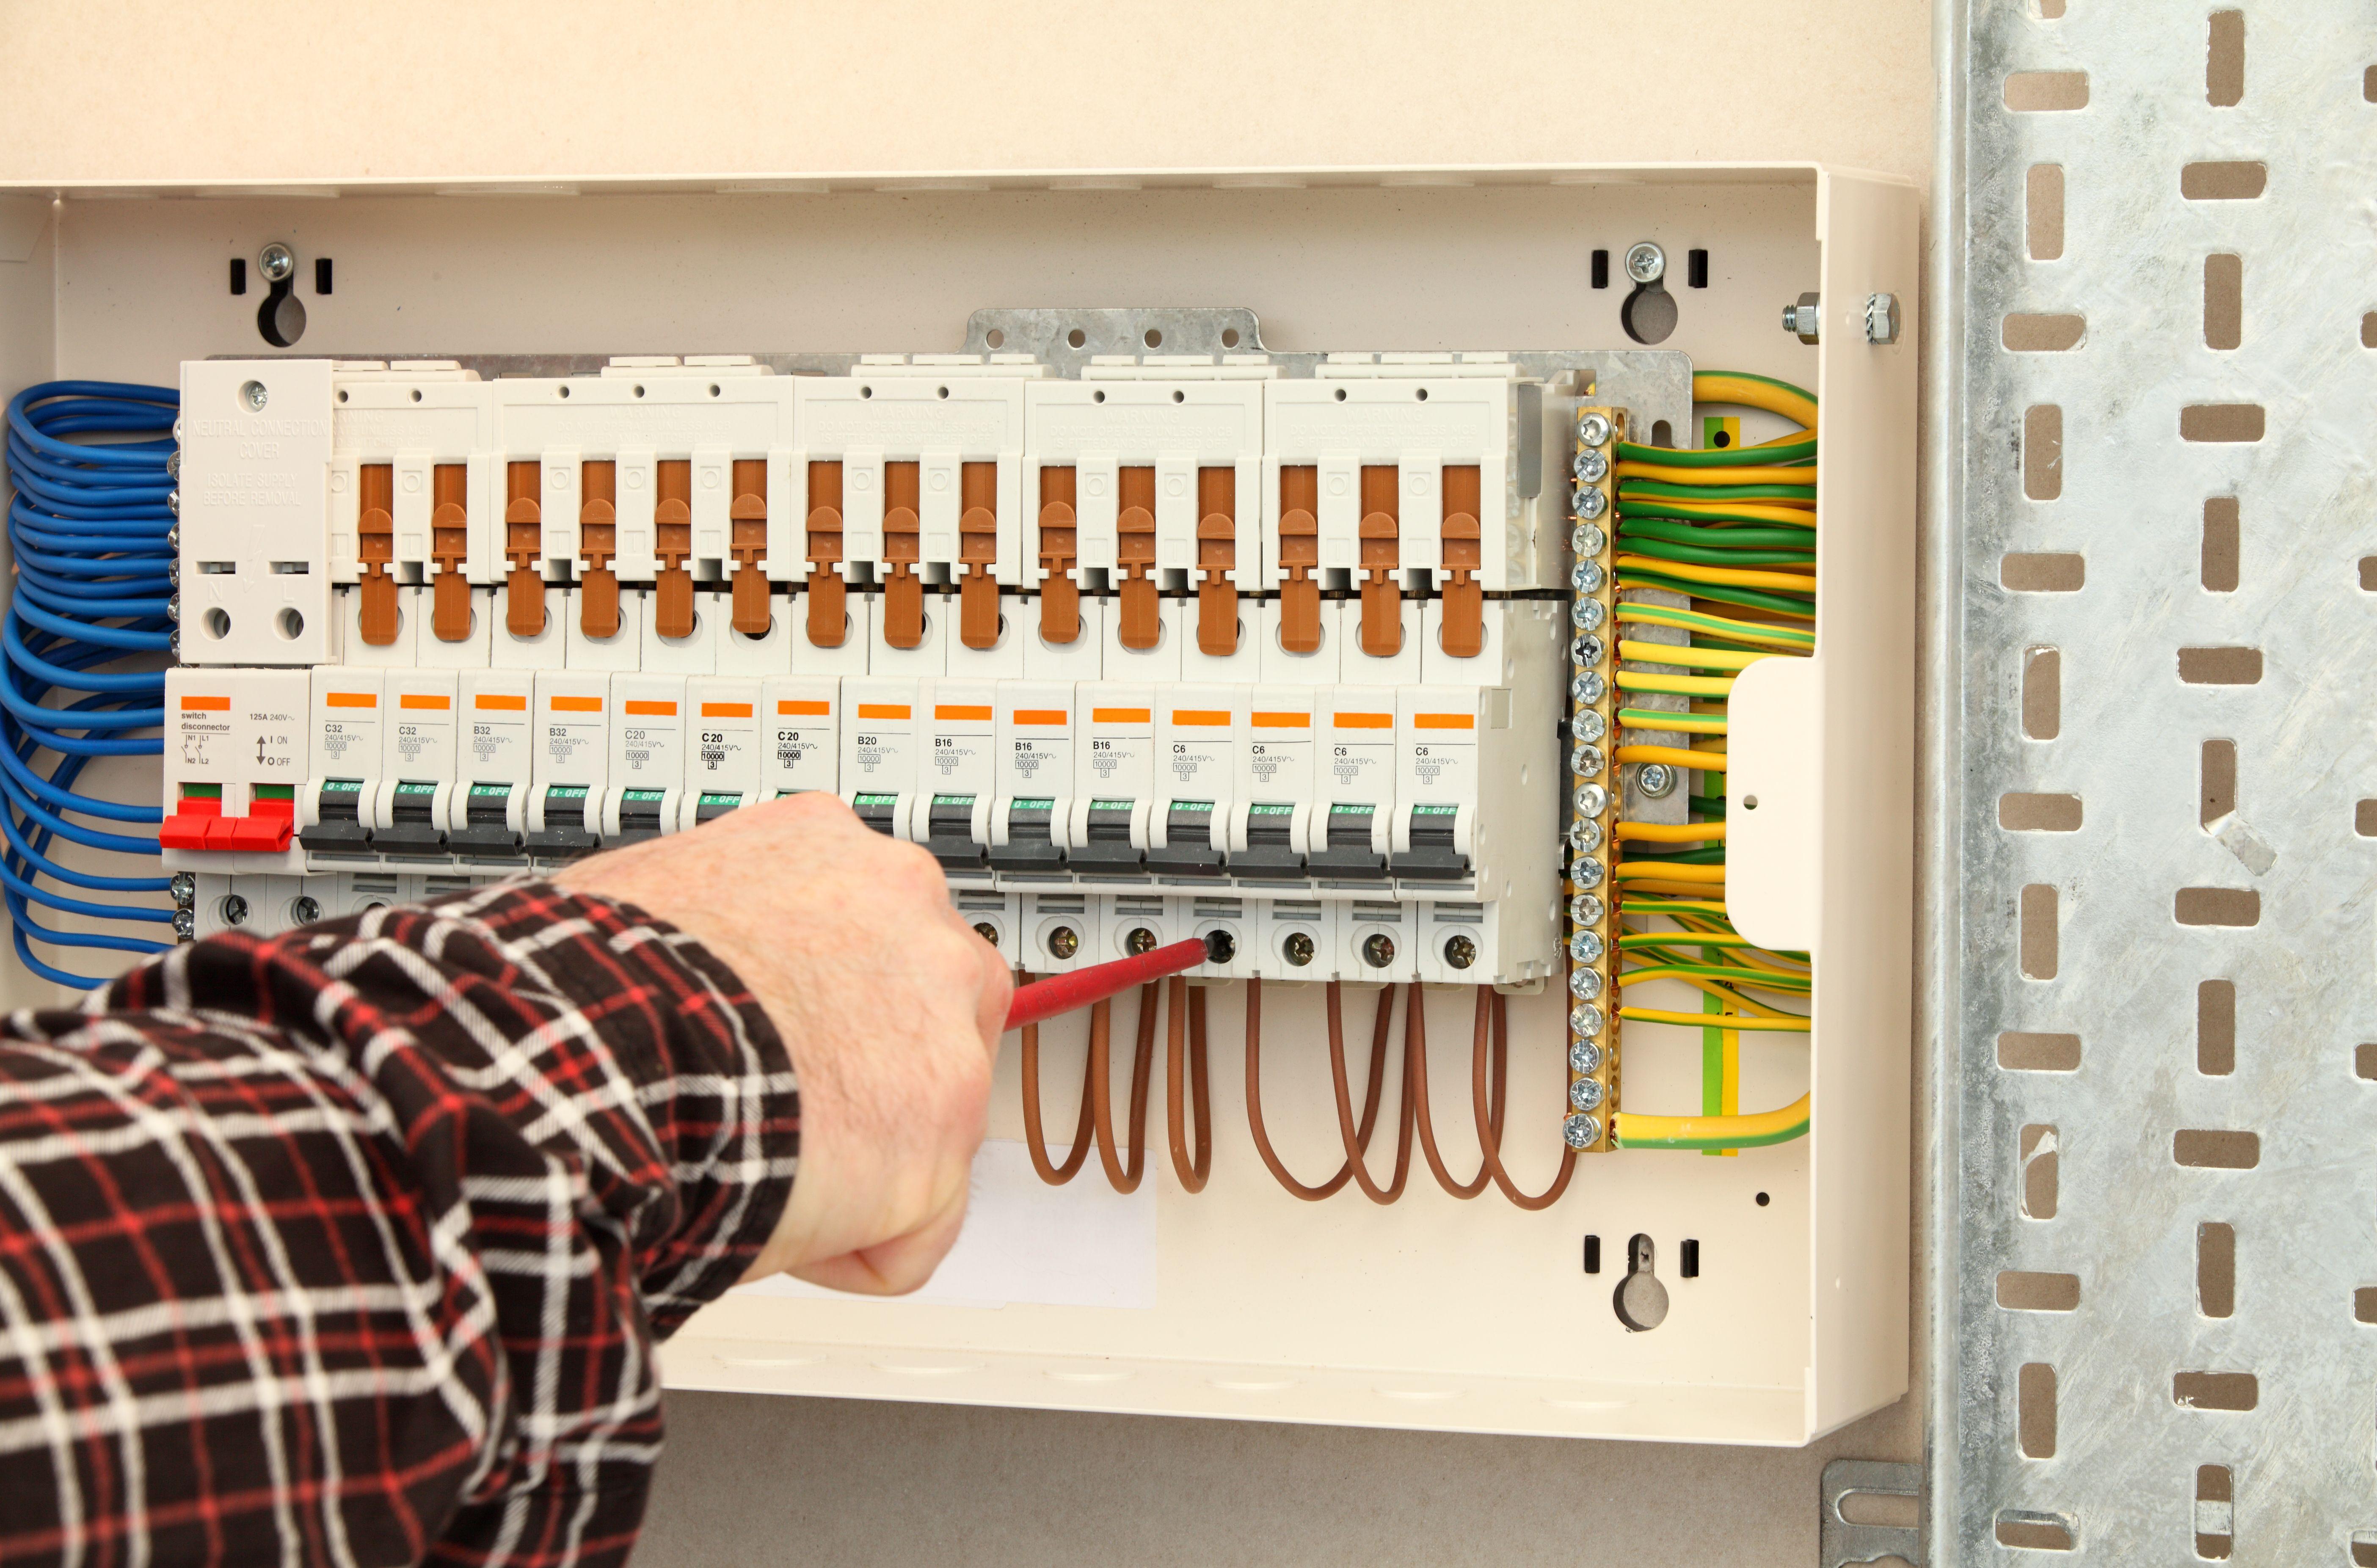 electrician-working-at-a-fuse-box-183816841-5877c5075f9b584db3490d1a